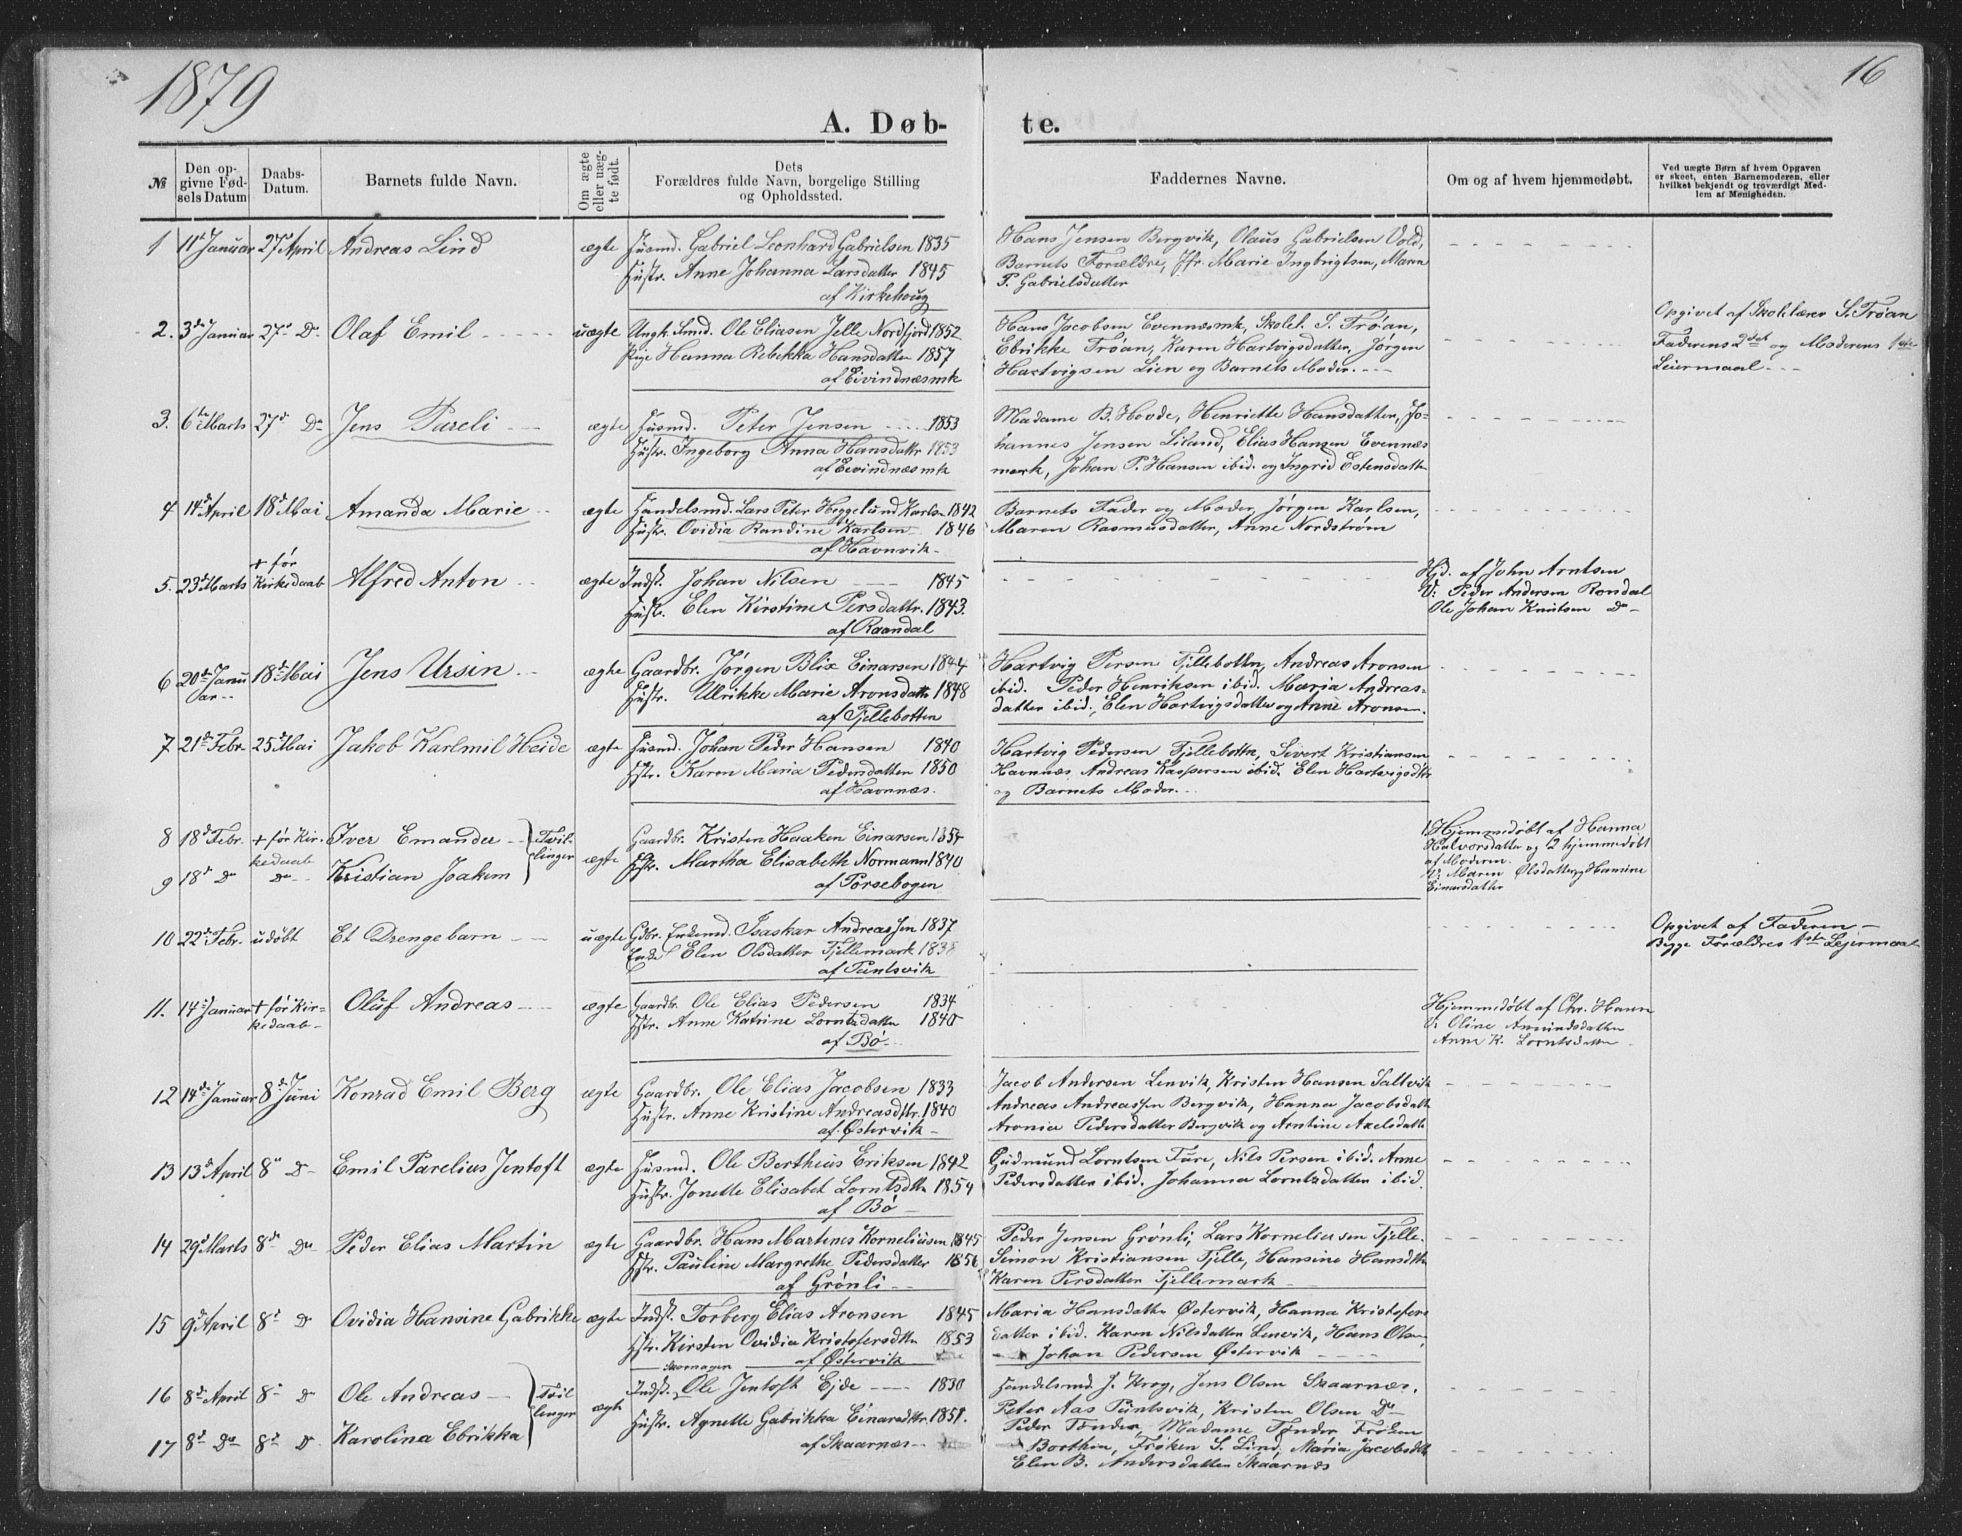 SAT, Ministerialprotokoller, klokkerbøker og fødselsregistre - Nordland, 863/L0913: Klokkerbok nr. 863C03, 1877-1885, s. 16